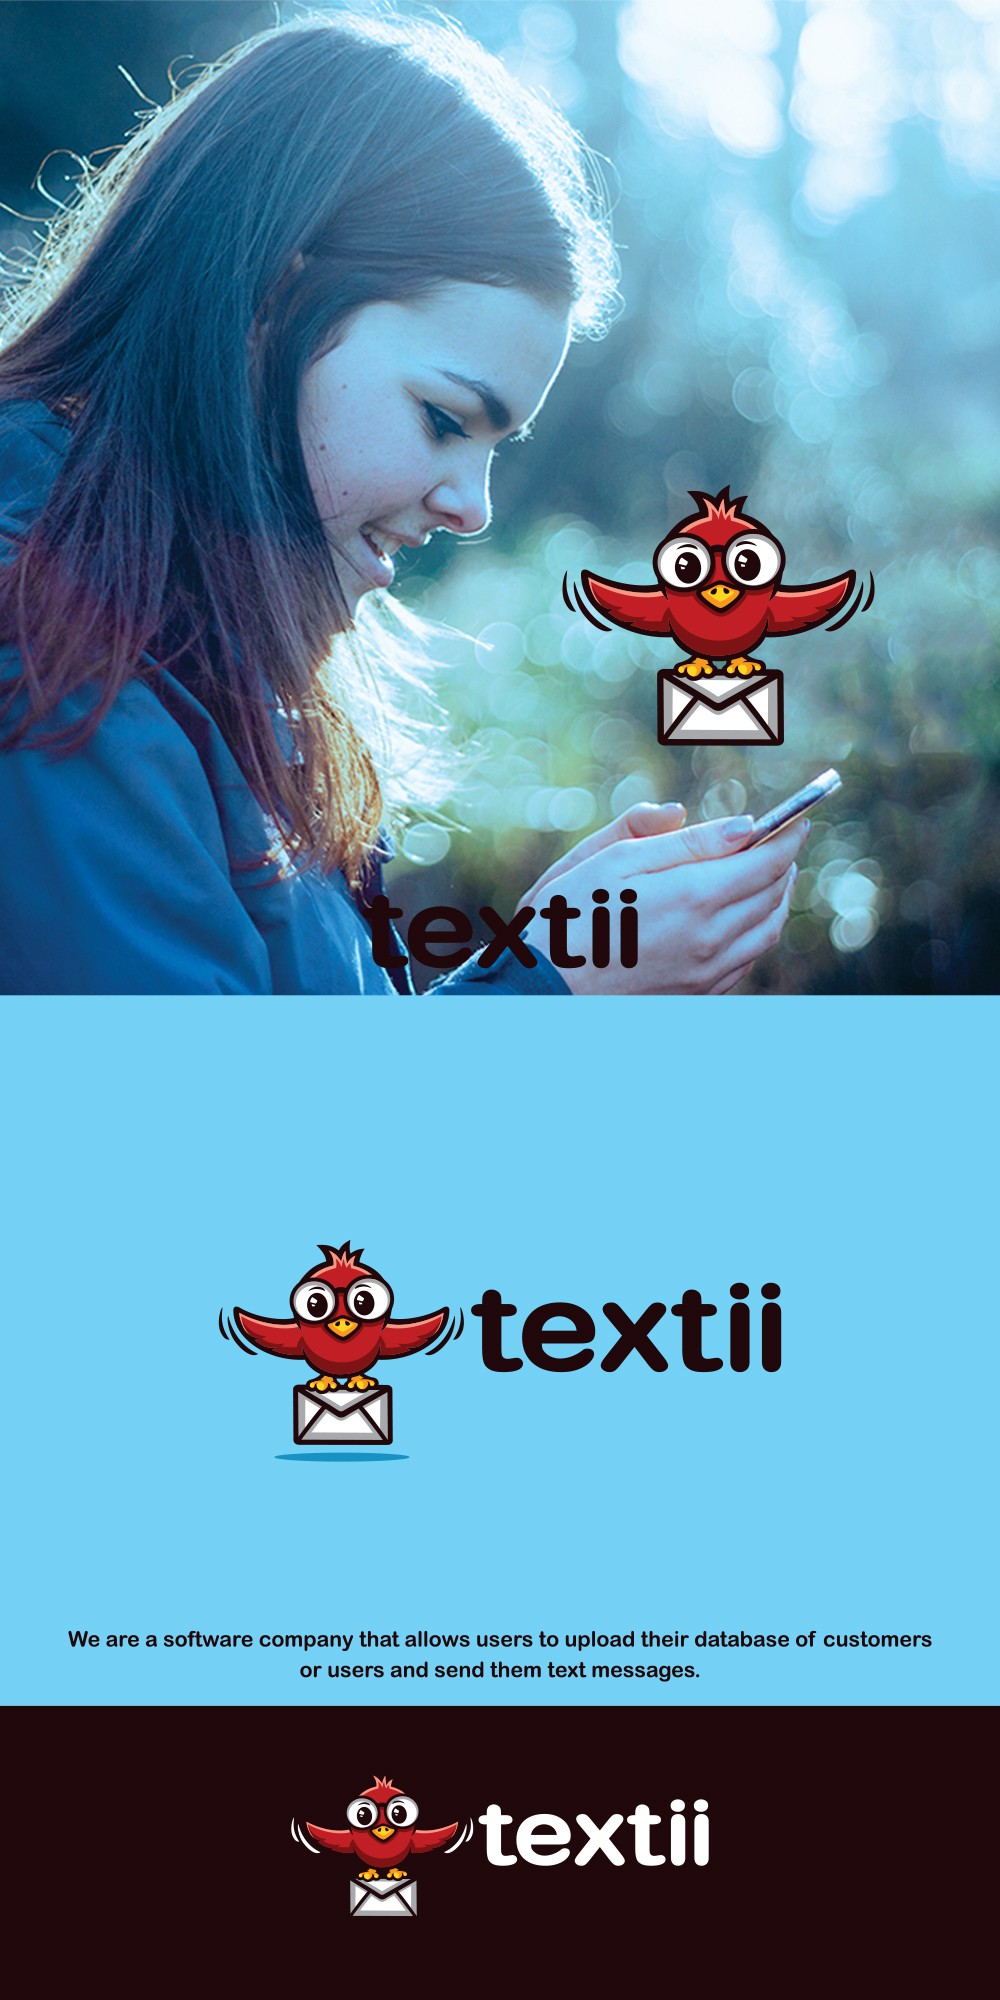 textii Logo Contest